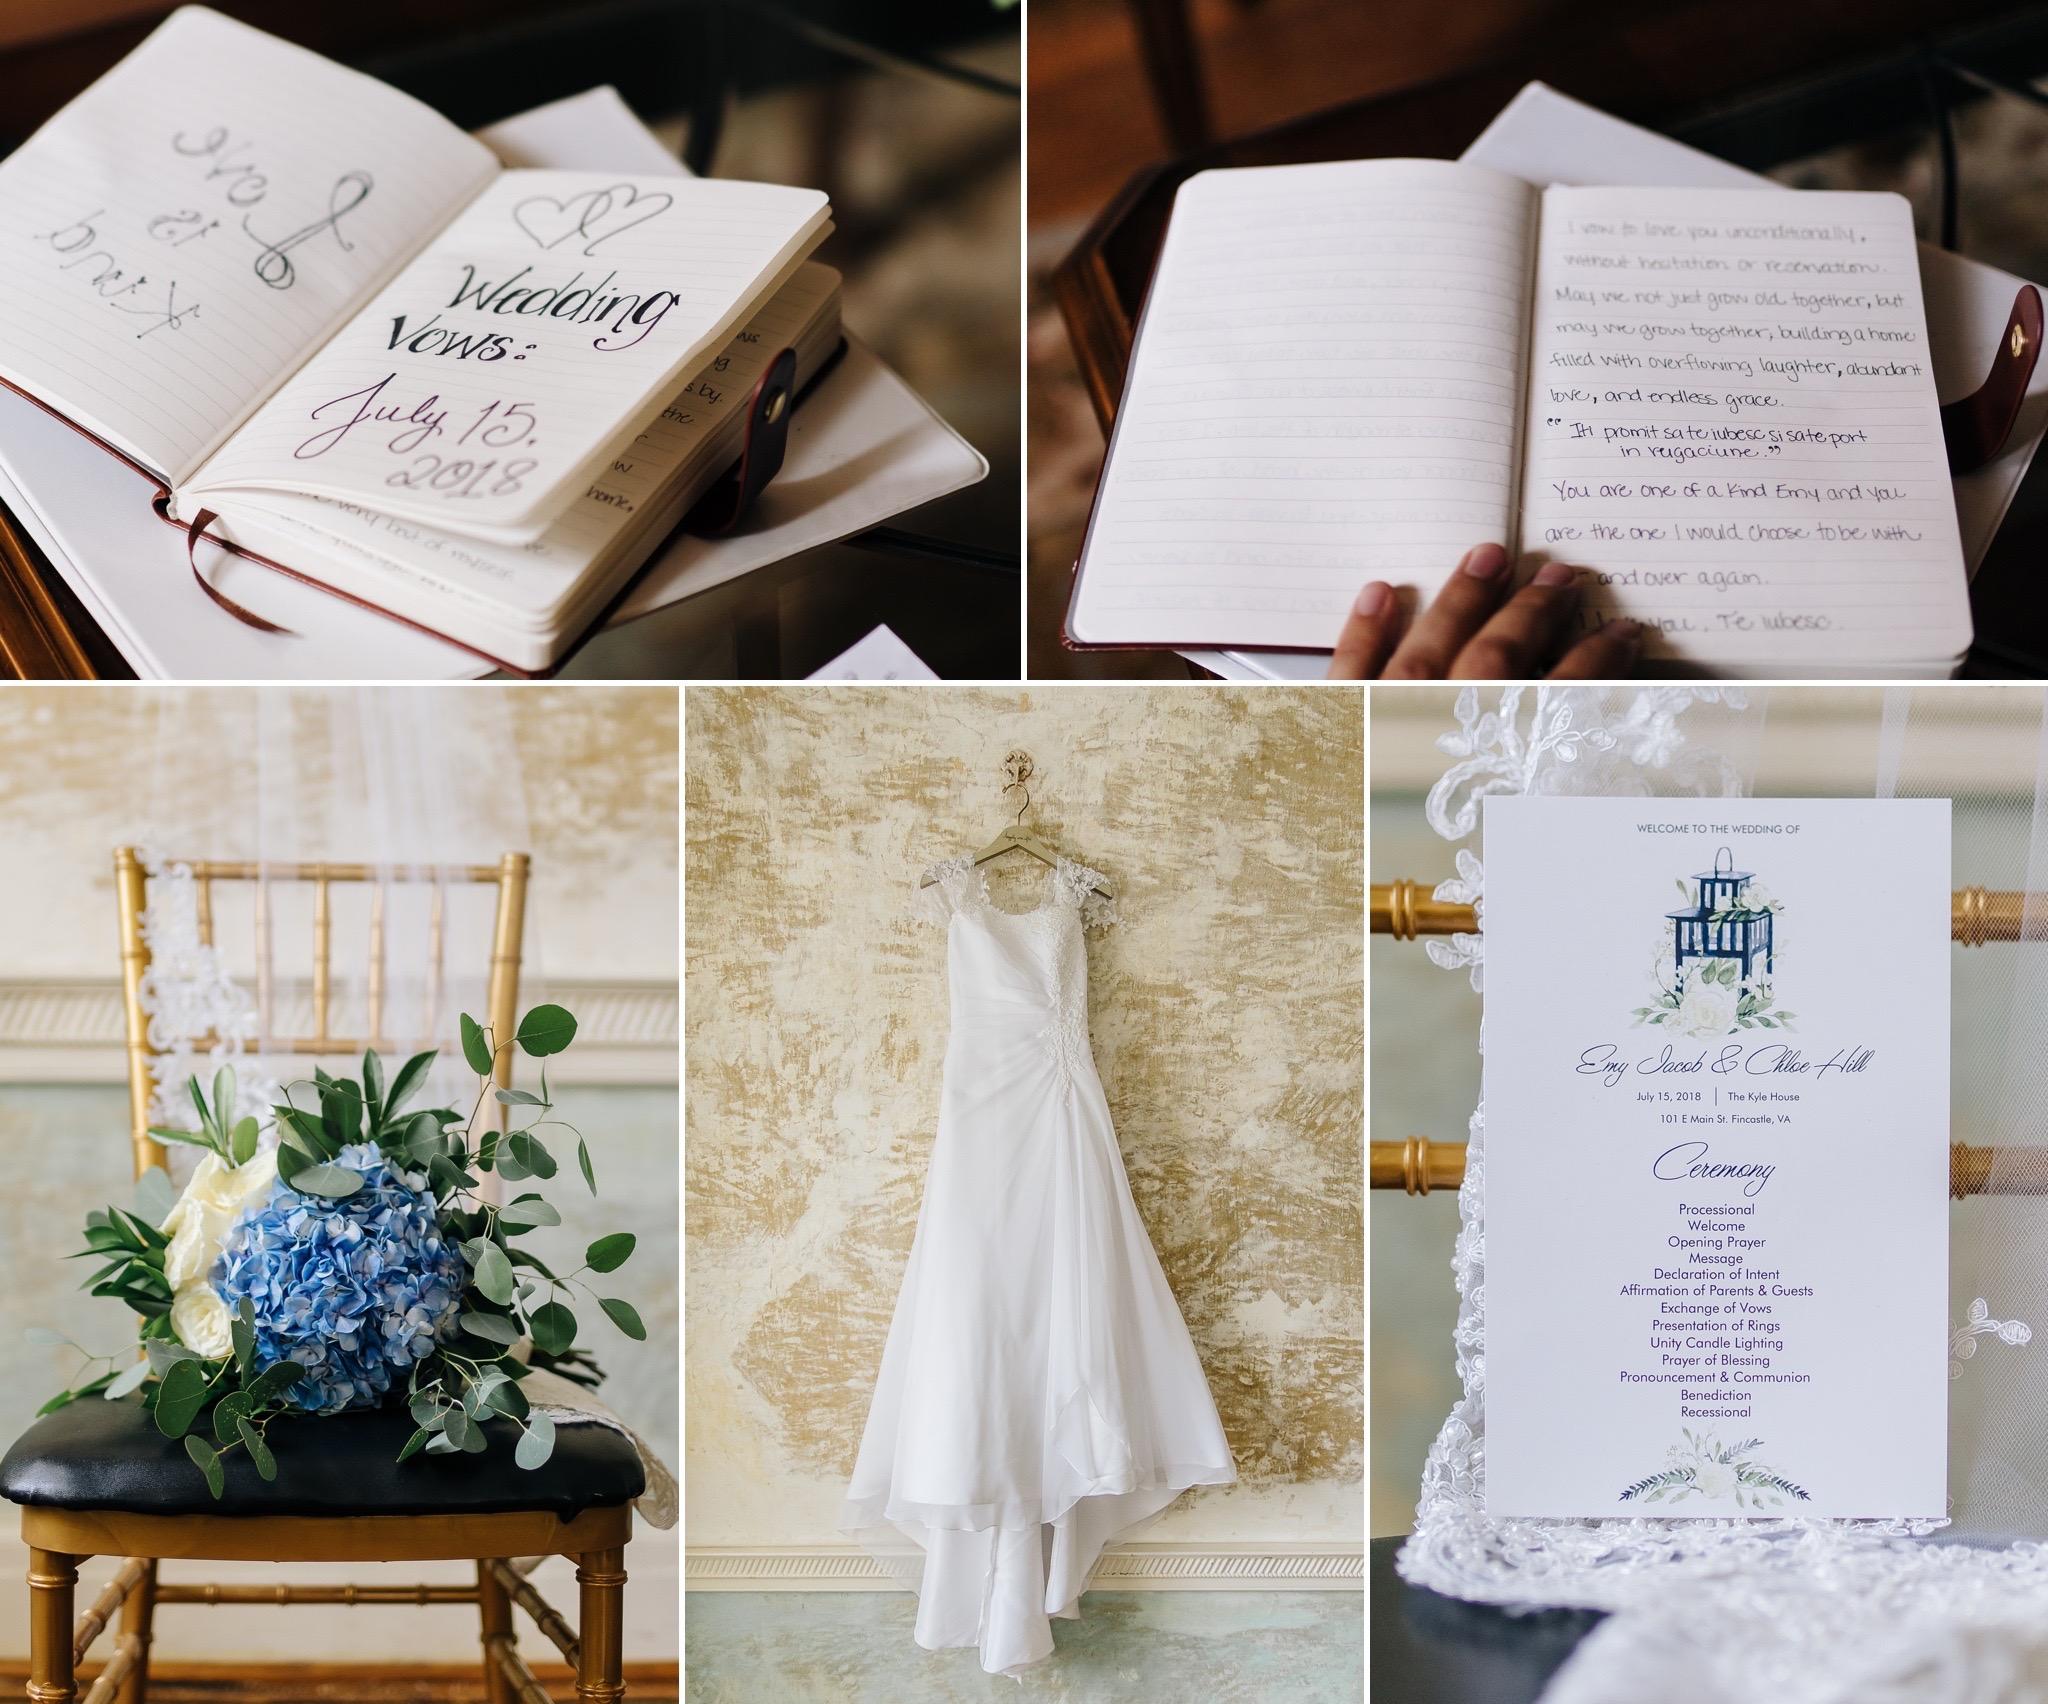 intimate_kyle_house_wedding_virginia_jonathan_hannah_photography-1.jpg